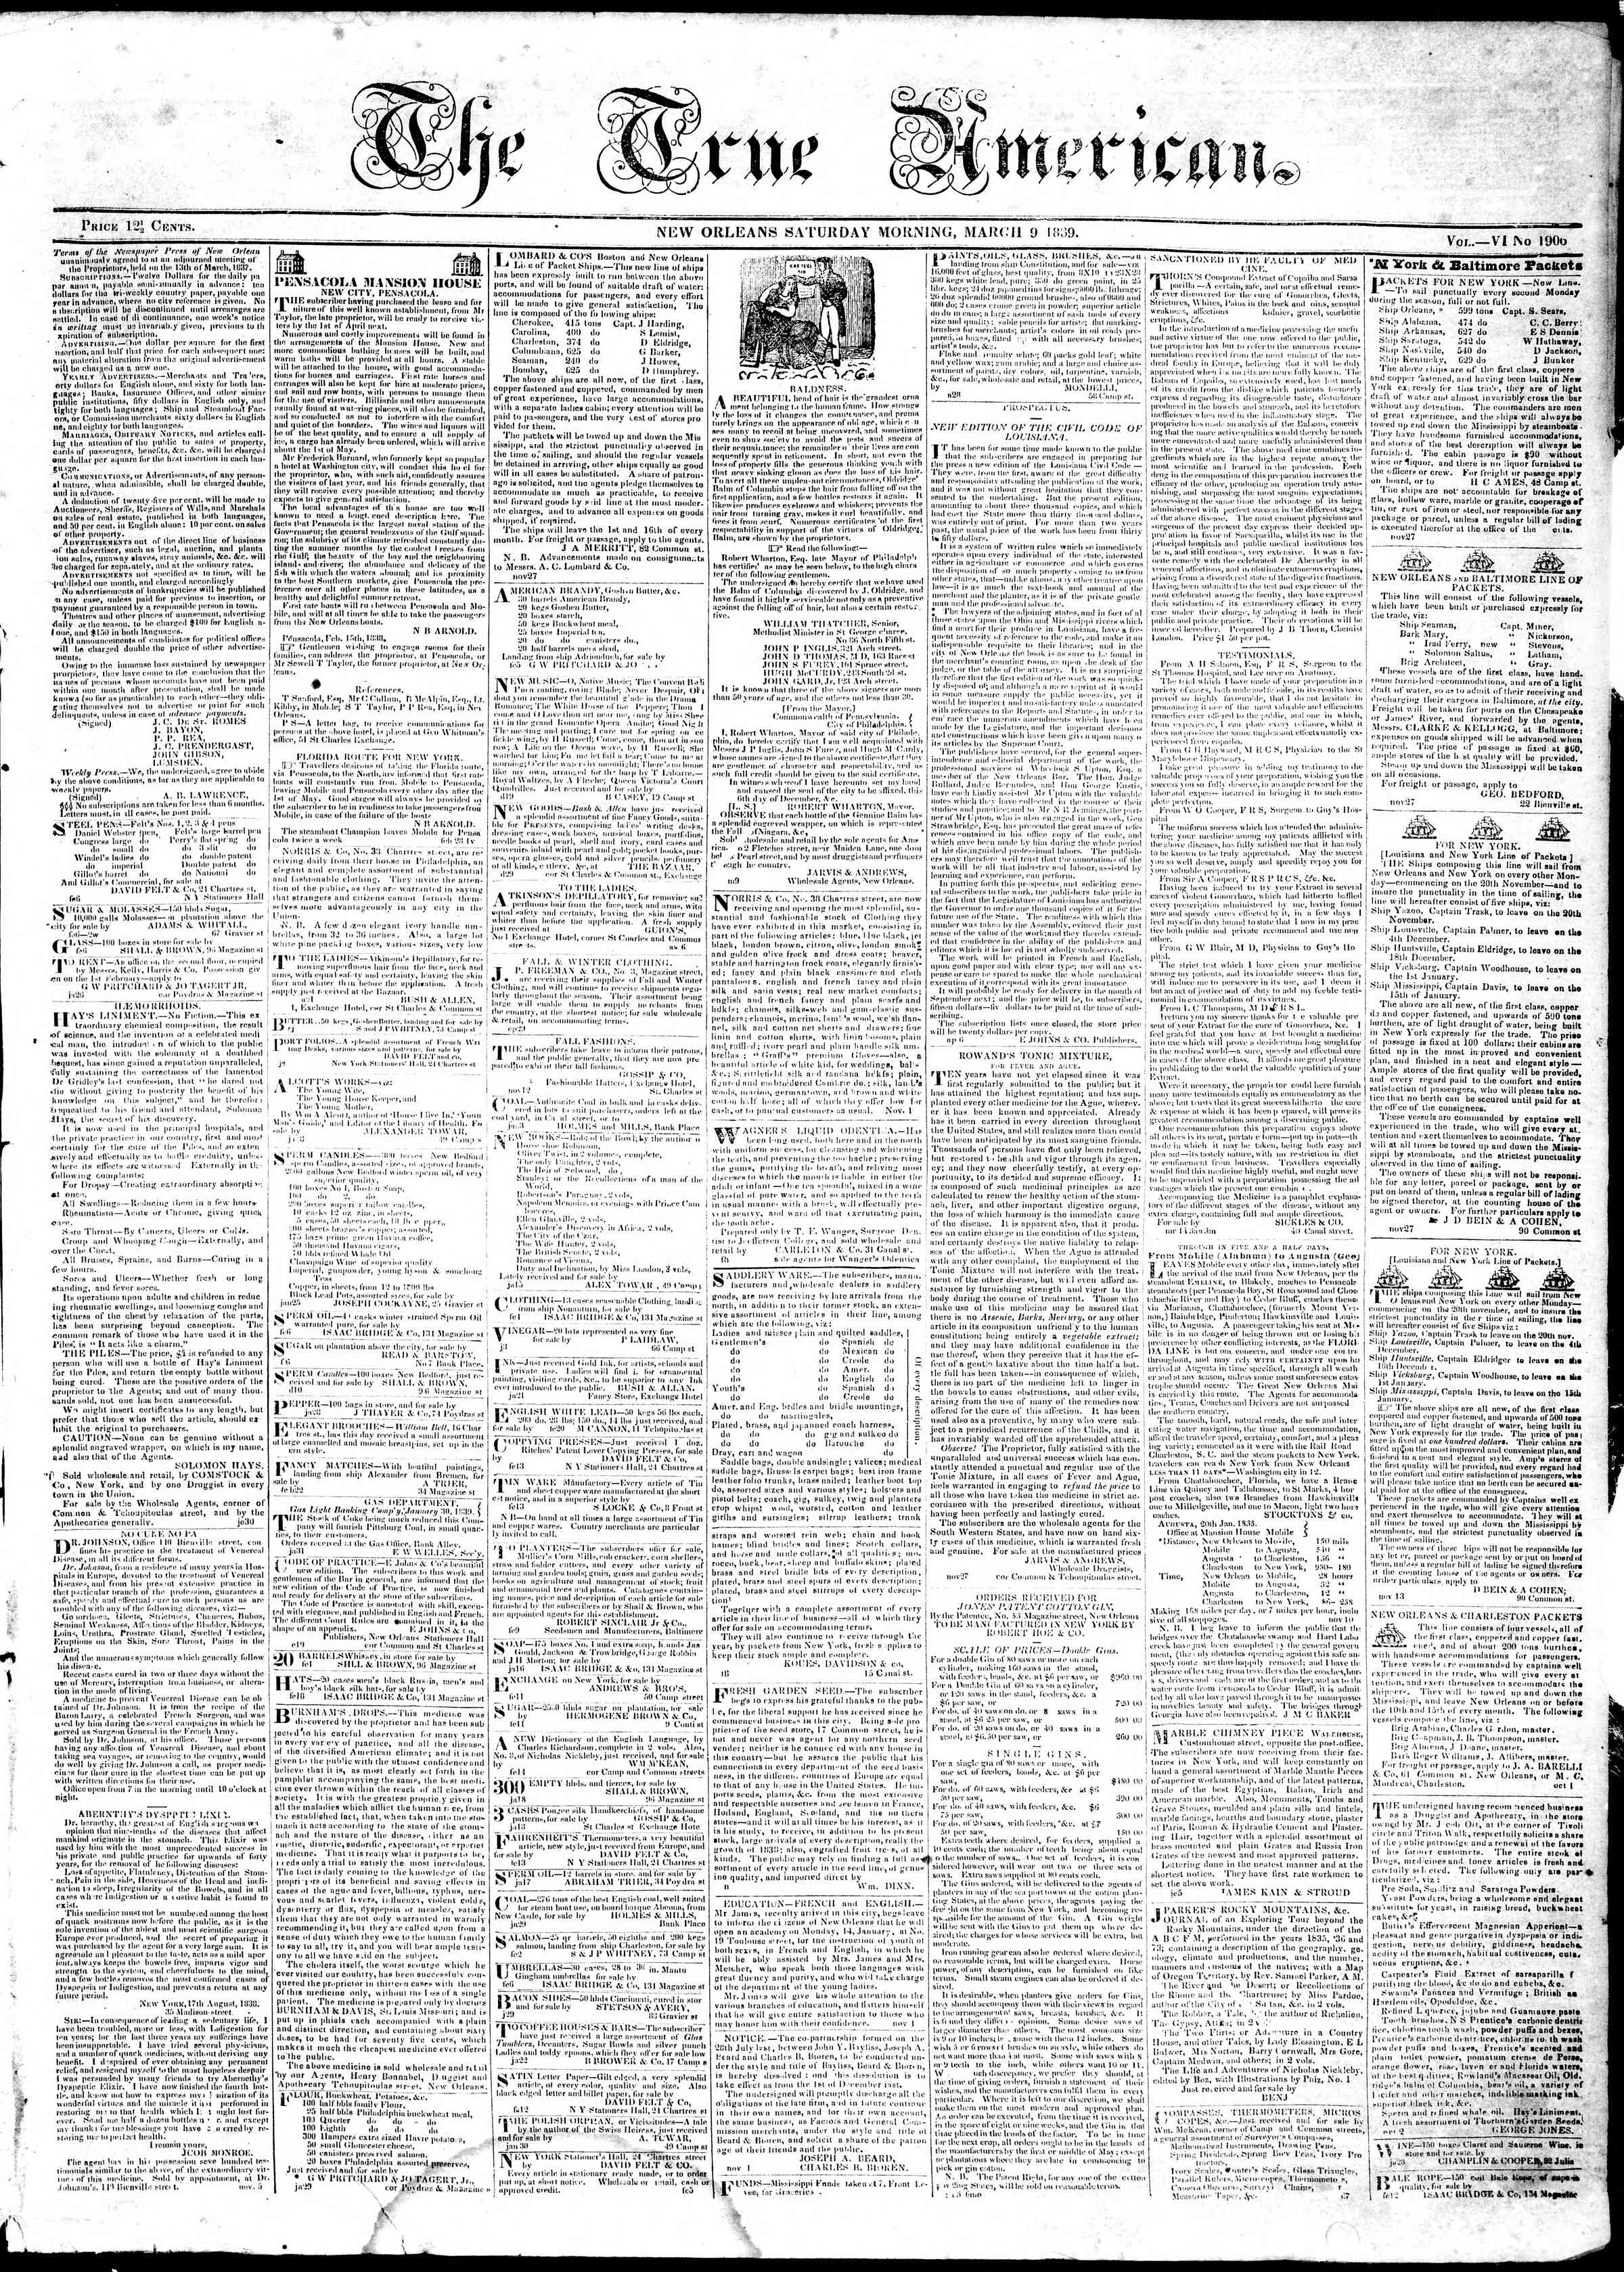 9 Mart 1839 Tarihli True American Gazetesi Sayfa 1